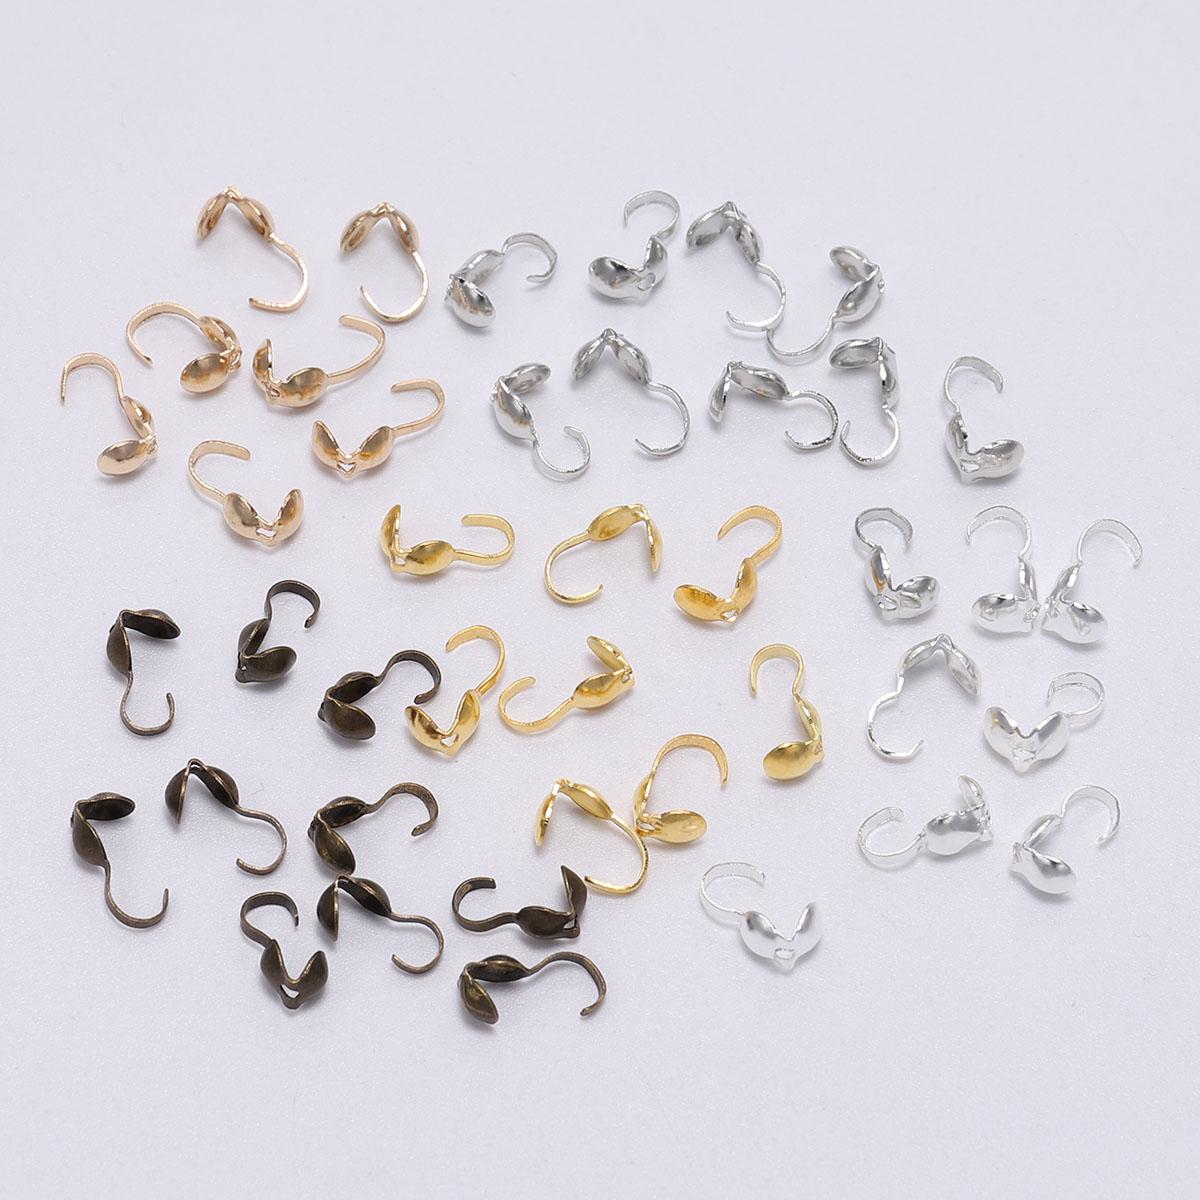 200pcs 4x2.8mm Sliver Metal Cord End Caps Clasps Crimp DIY Jewelry Makings